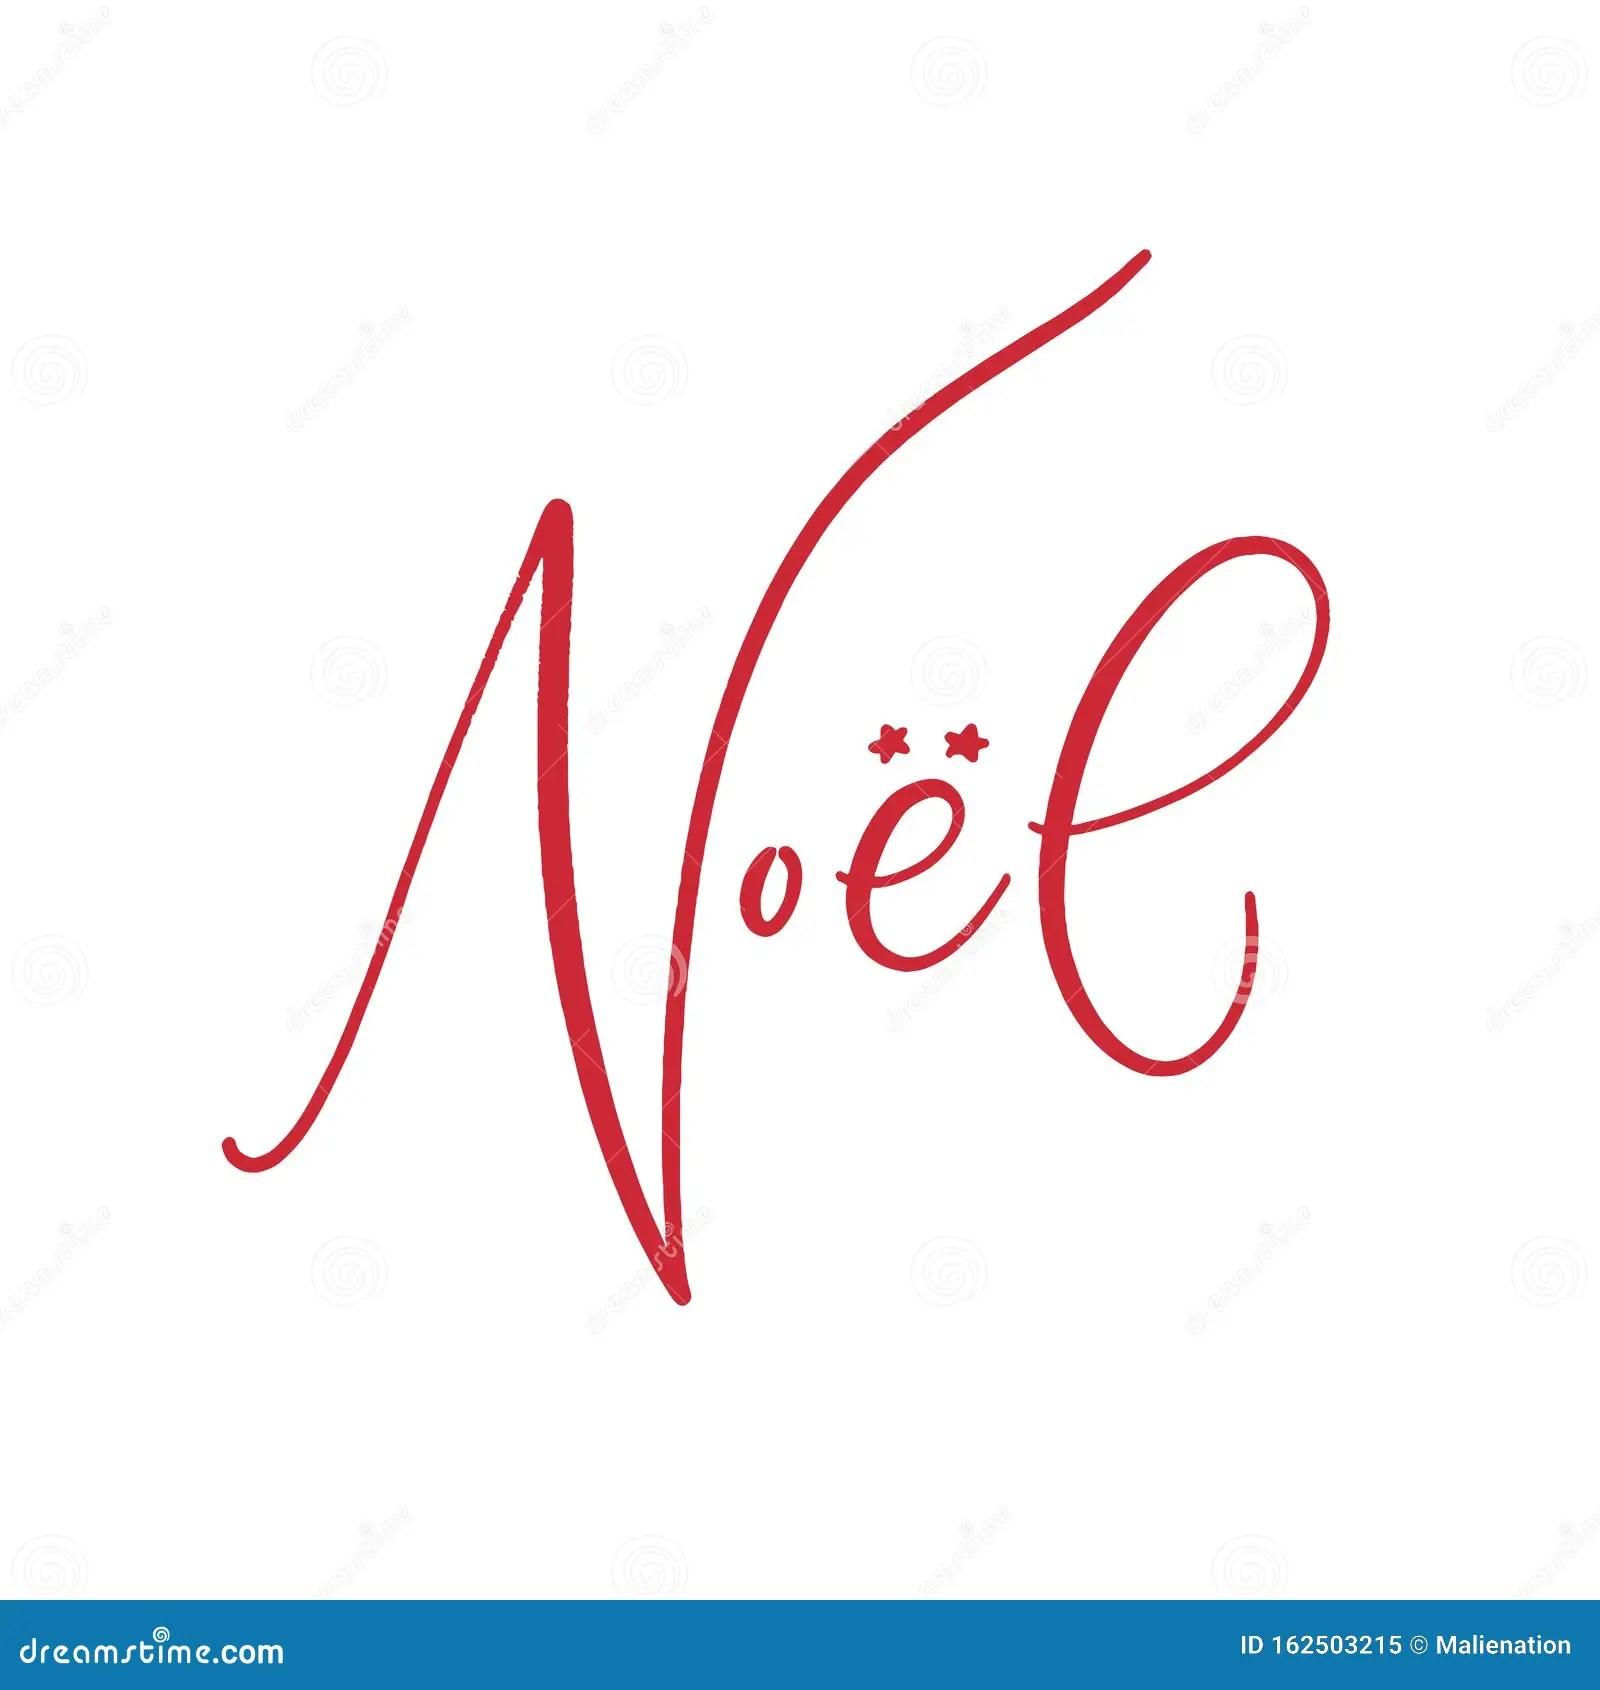 Noel From French Christmas Season Handwritten Typography